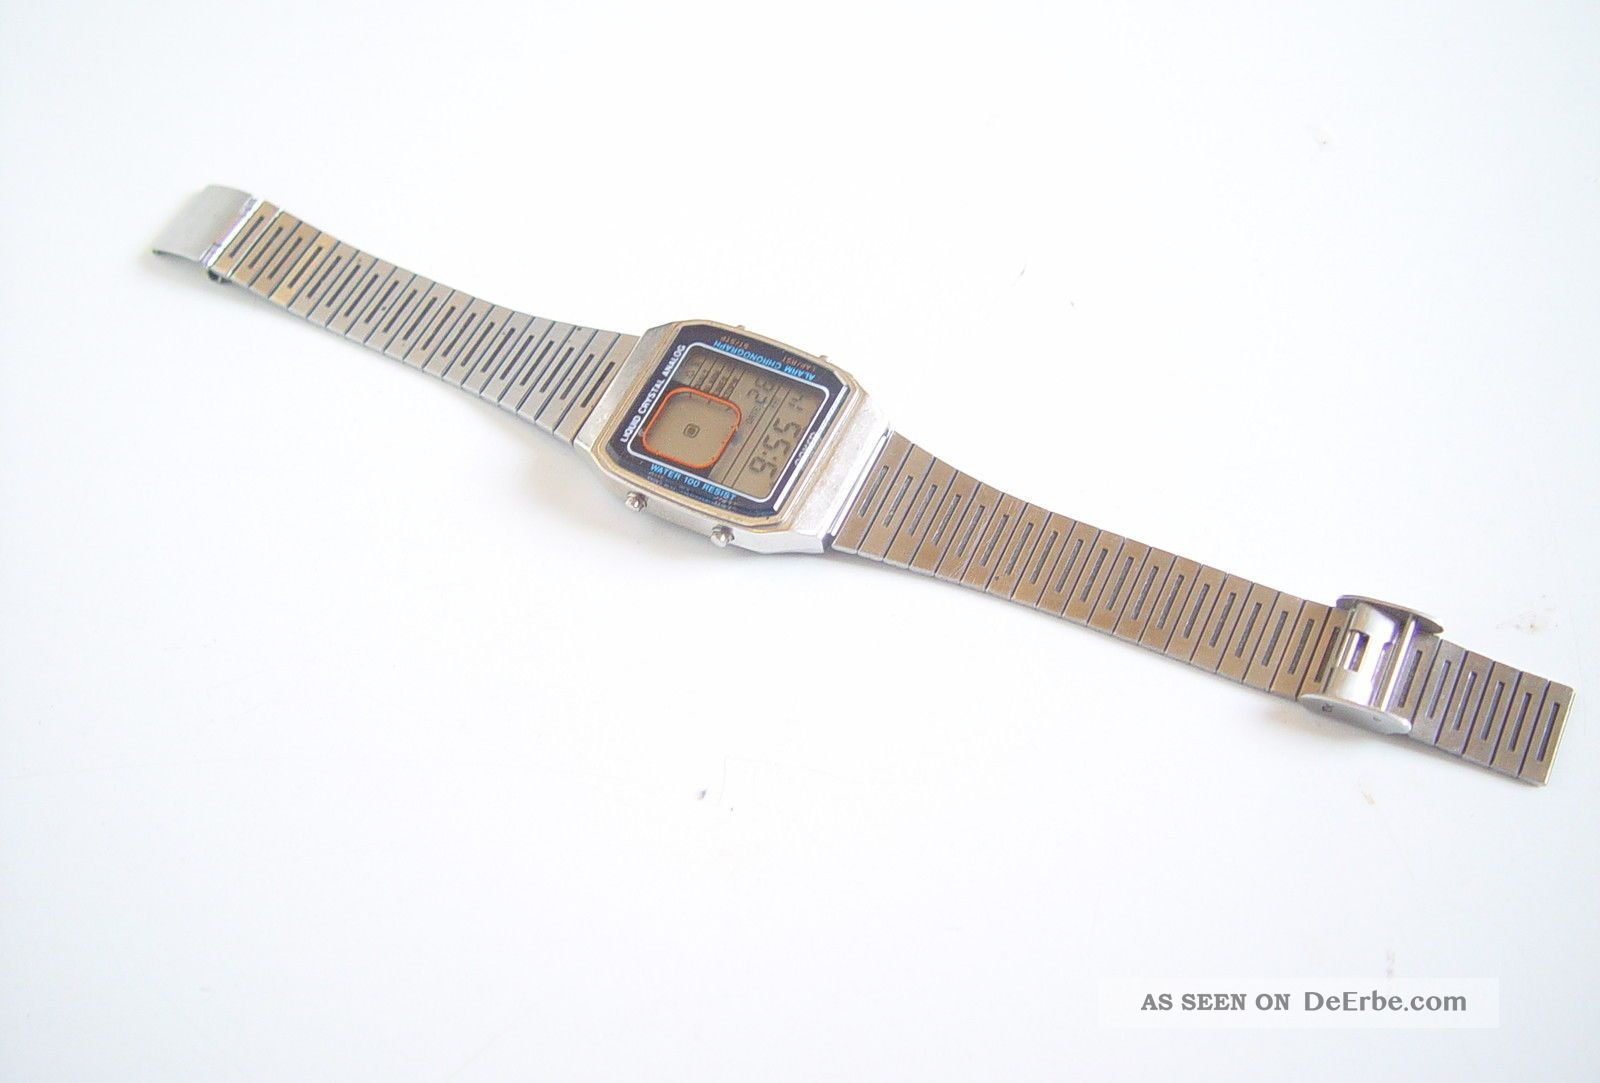 Vintage Anker Lcd Quartz Uhr Armband Uhr Watch Digital Edelstahl 1970-1979 Bild